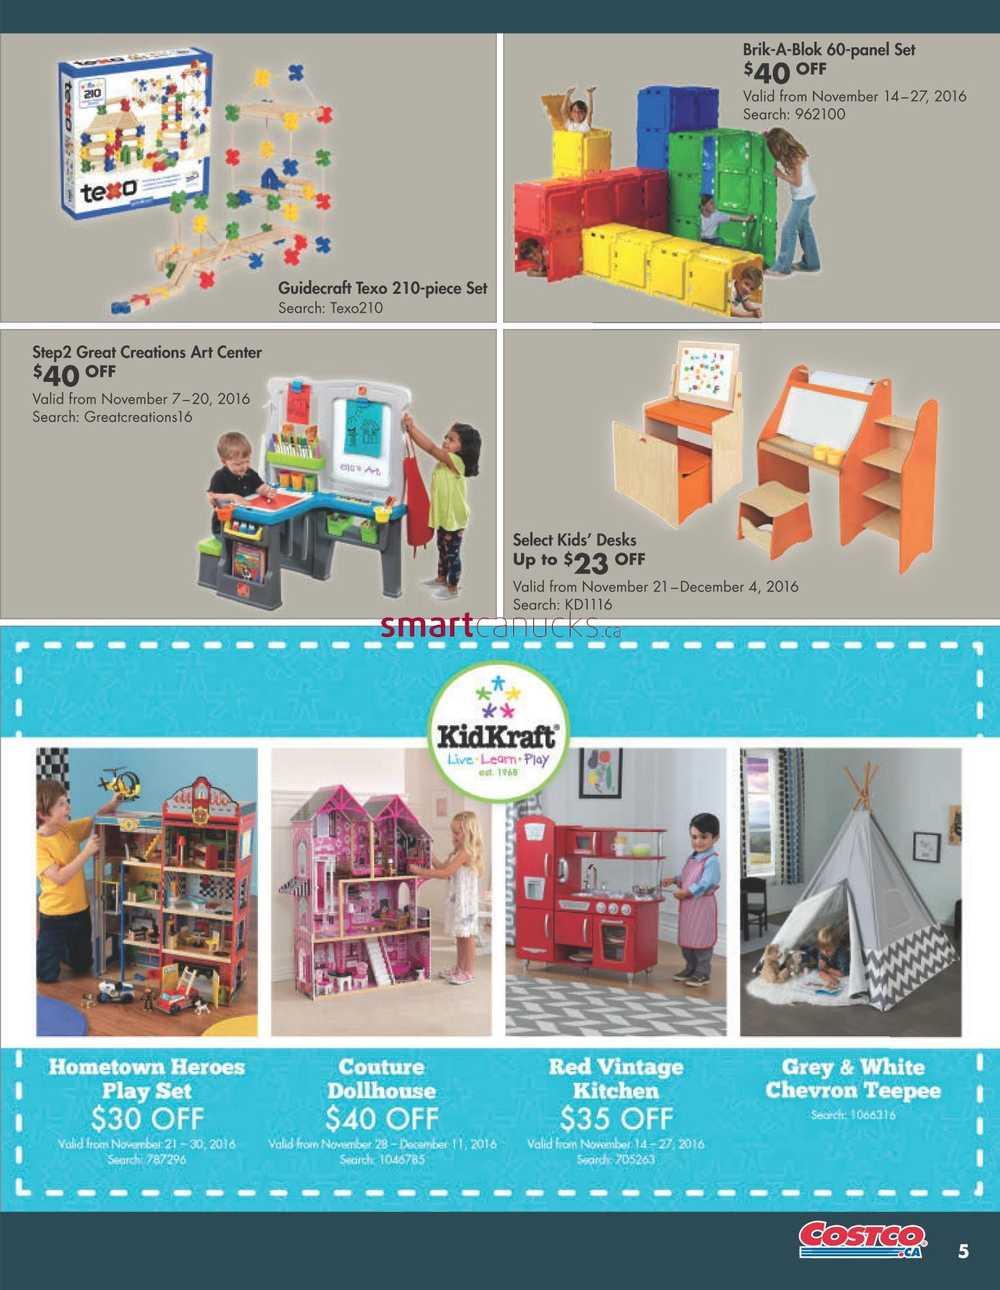 costco online catalogue november 1 to december 31. Black Bedroom Furniture Sets. Home Design Ideas